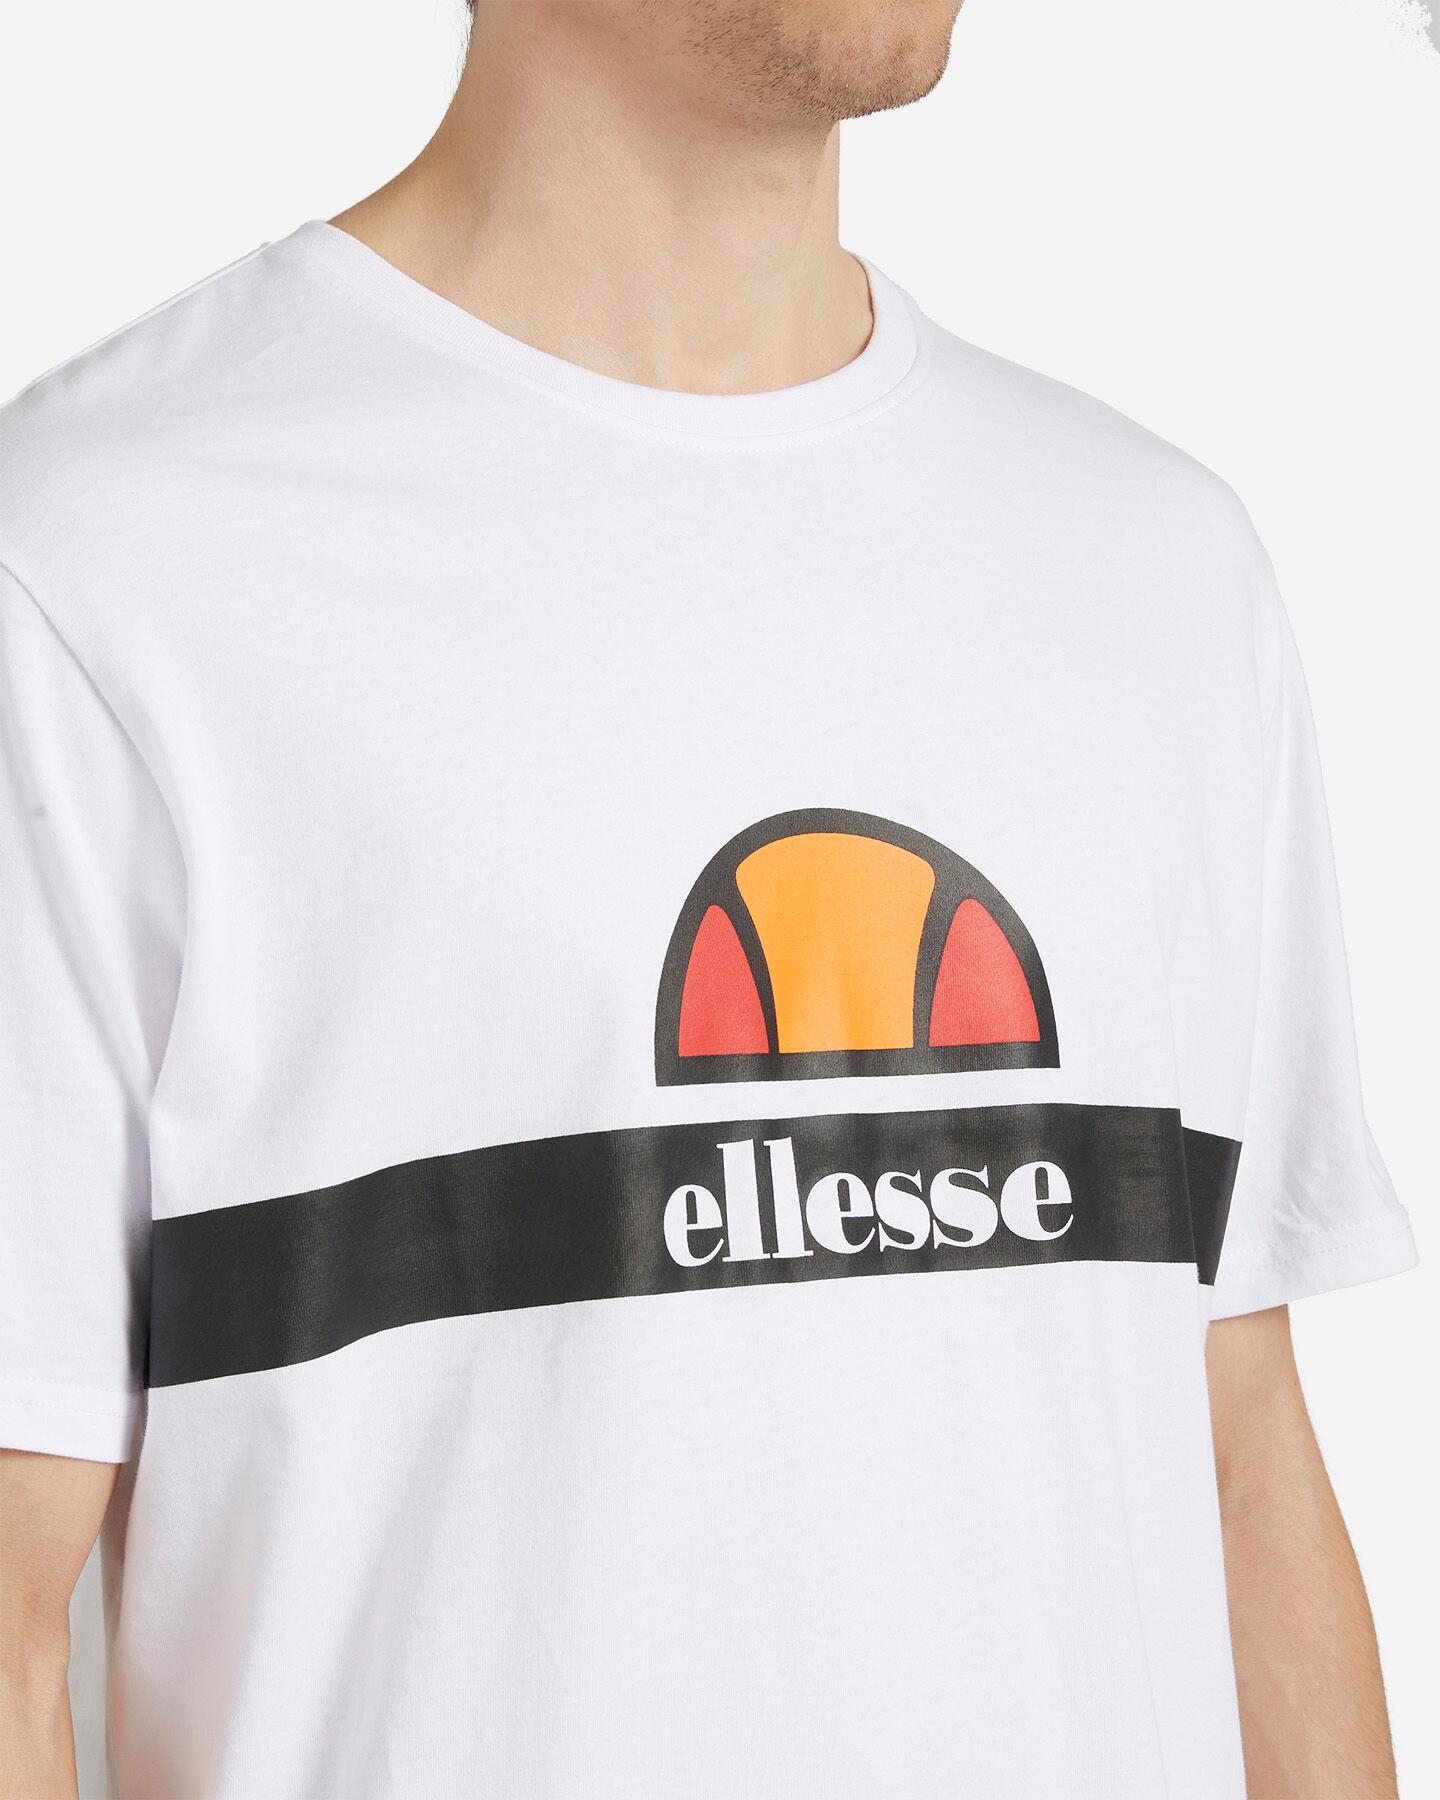 T-Shirt ELLESSE LOGO CENTRAL M S4088417 scatto 4